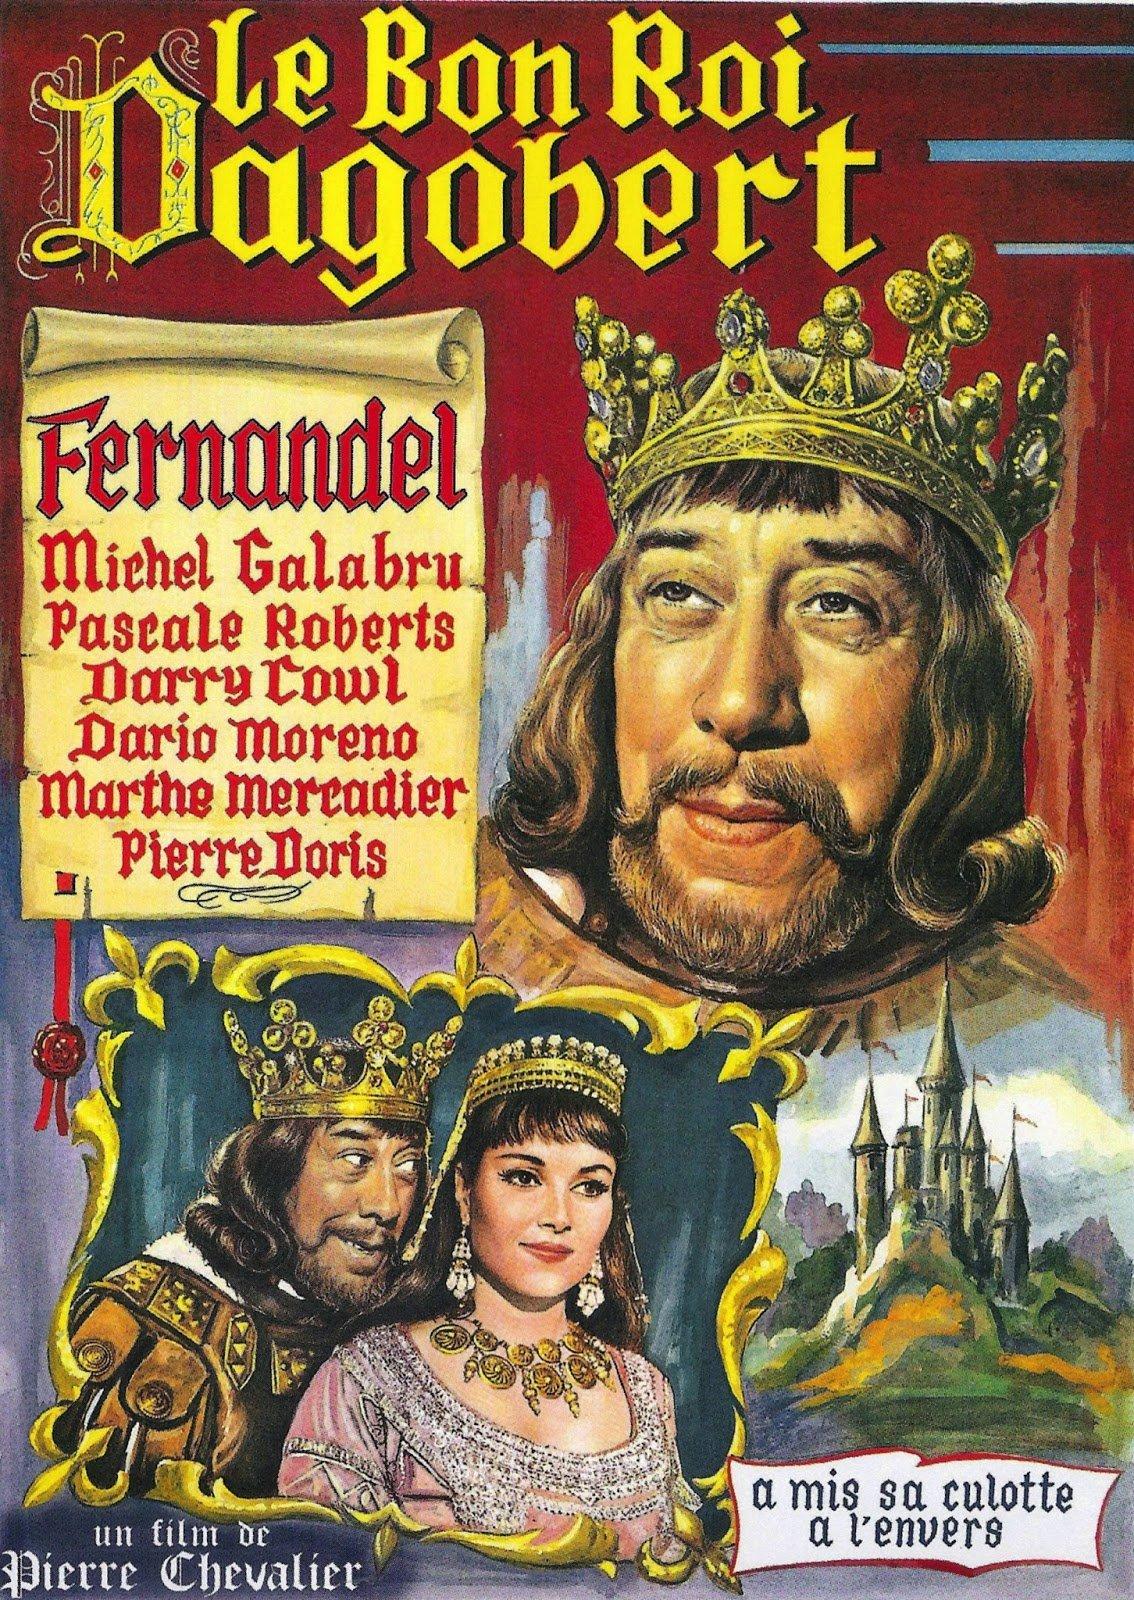 The Good King Dagobert